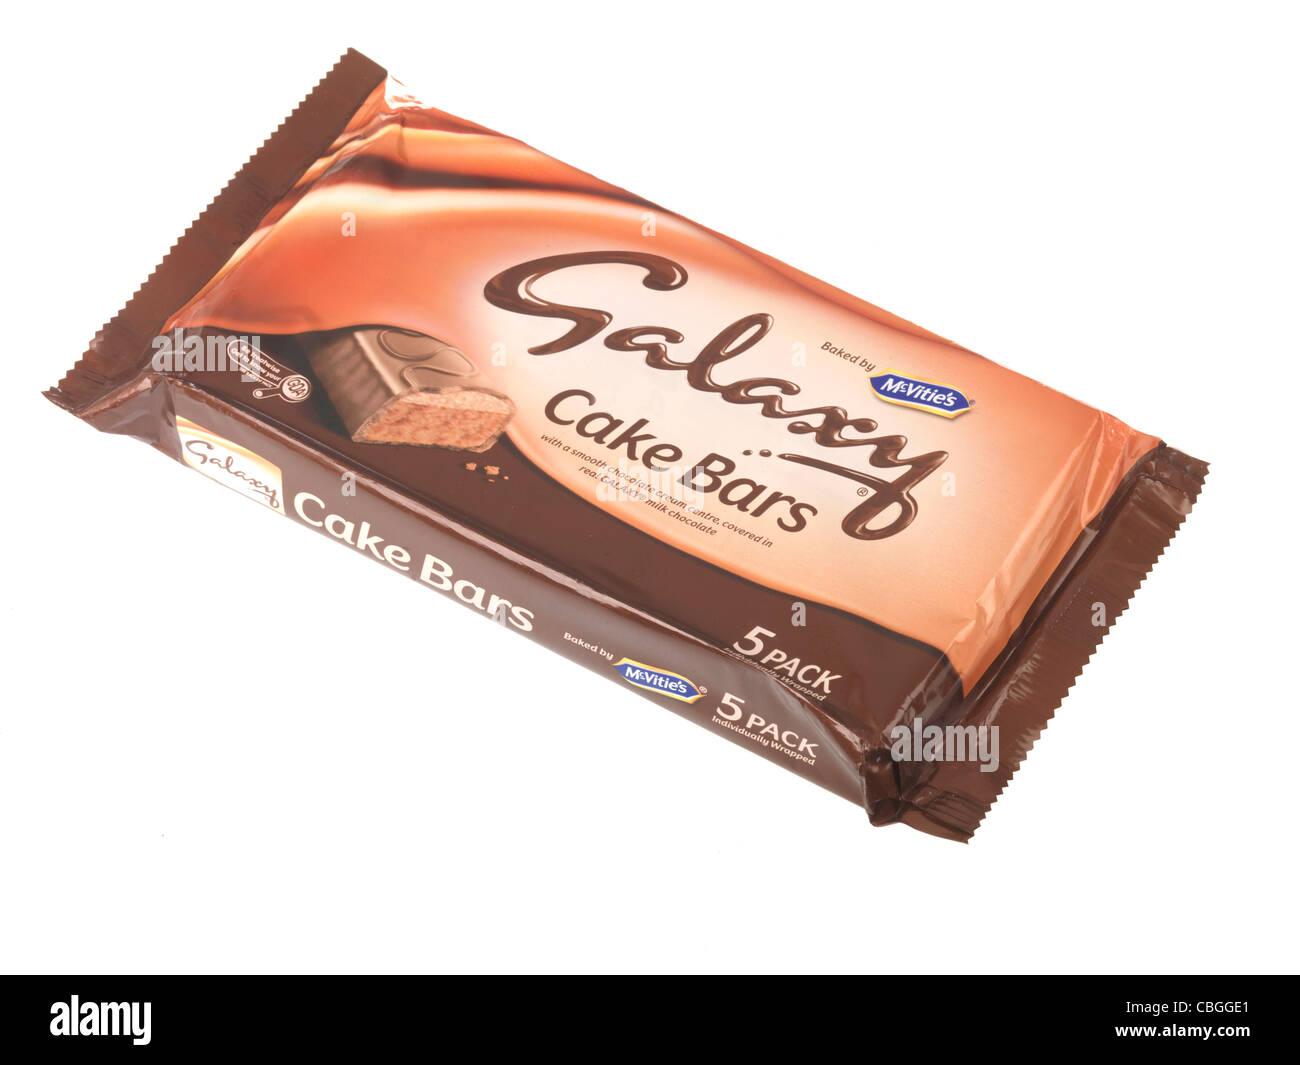 how to make galaxy chocolate